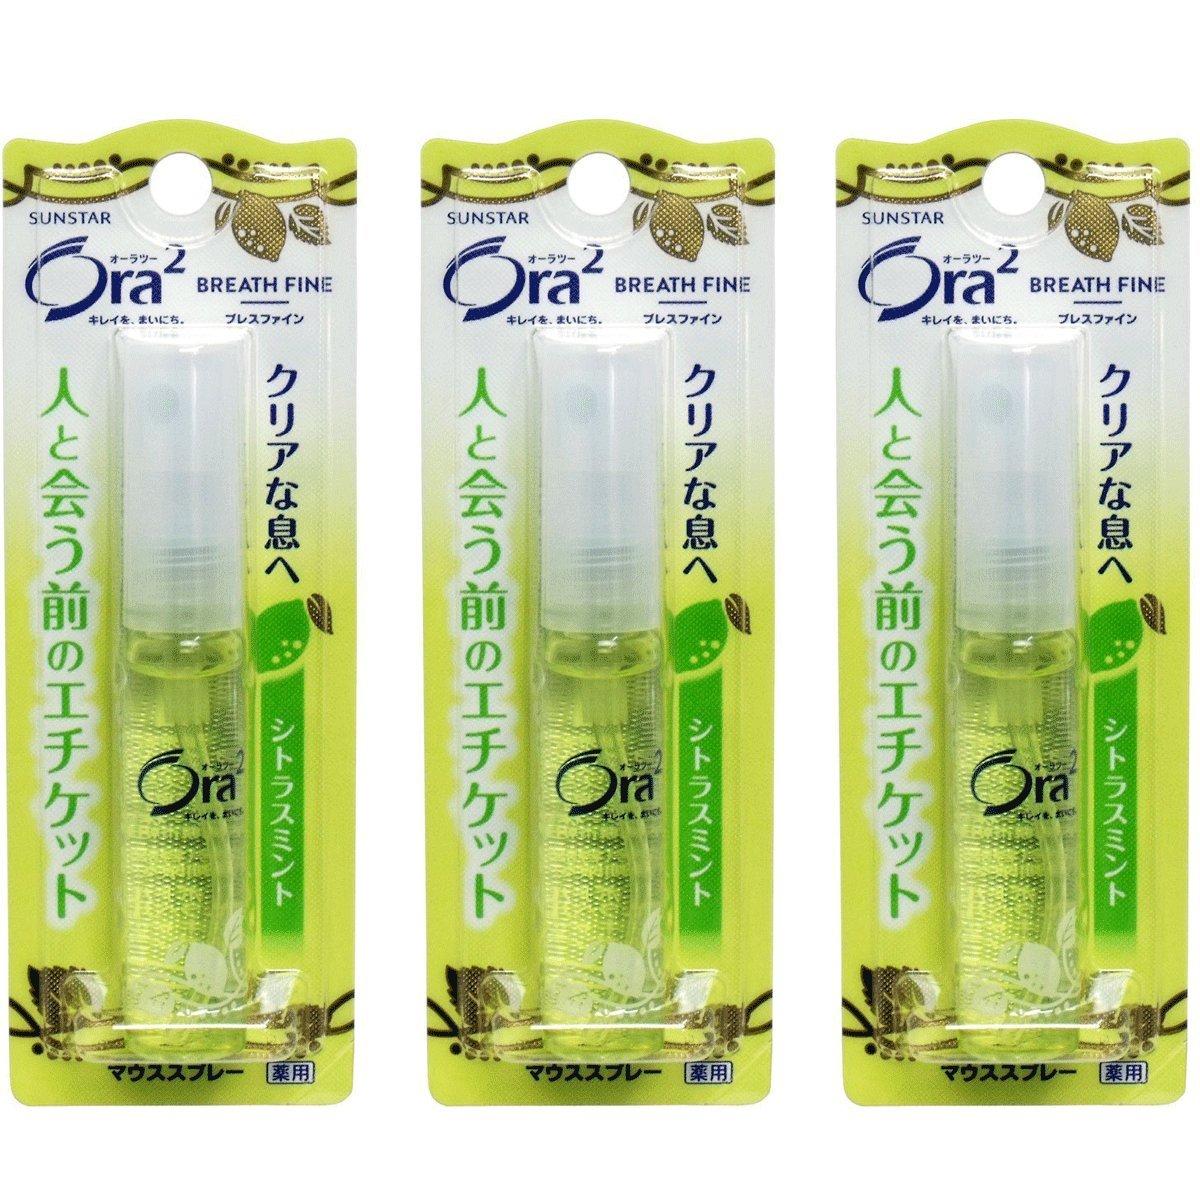 3 Bottle of Sunstar aura 2 Breath Fine Mouth Spray citrus mint 6ml [Imported By ☆SAIKO JAPAN☆]